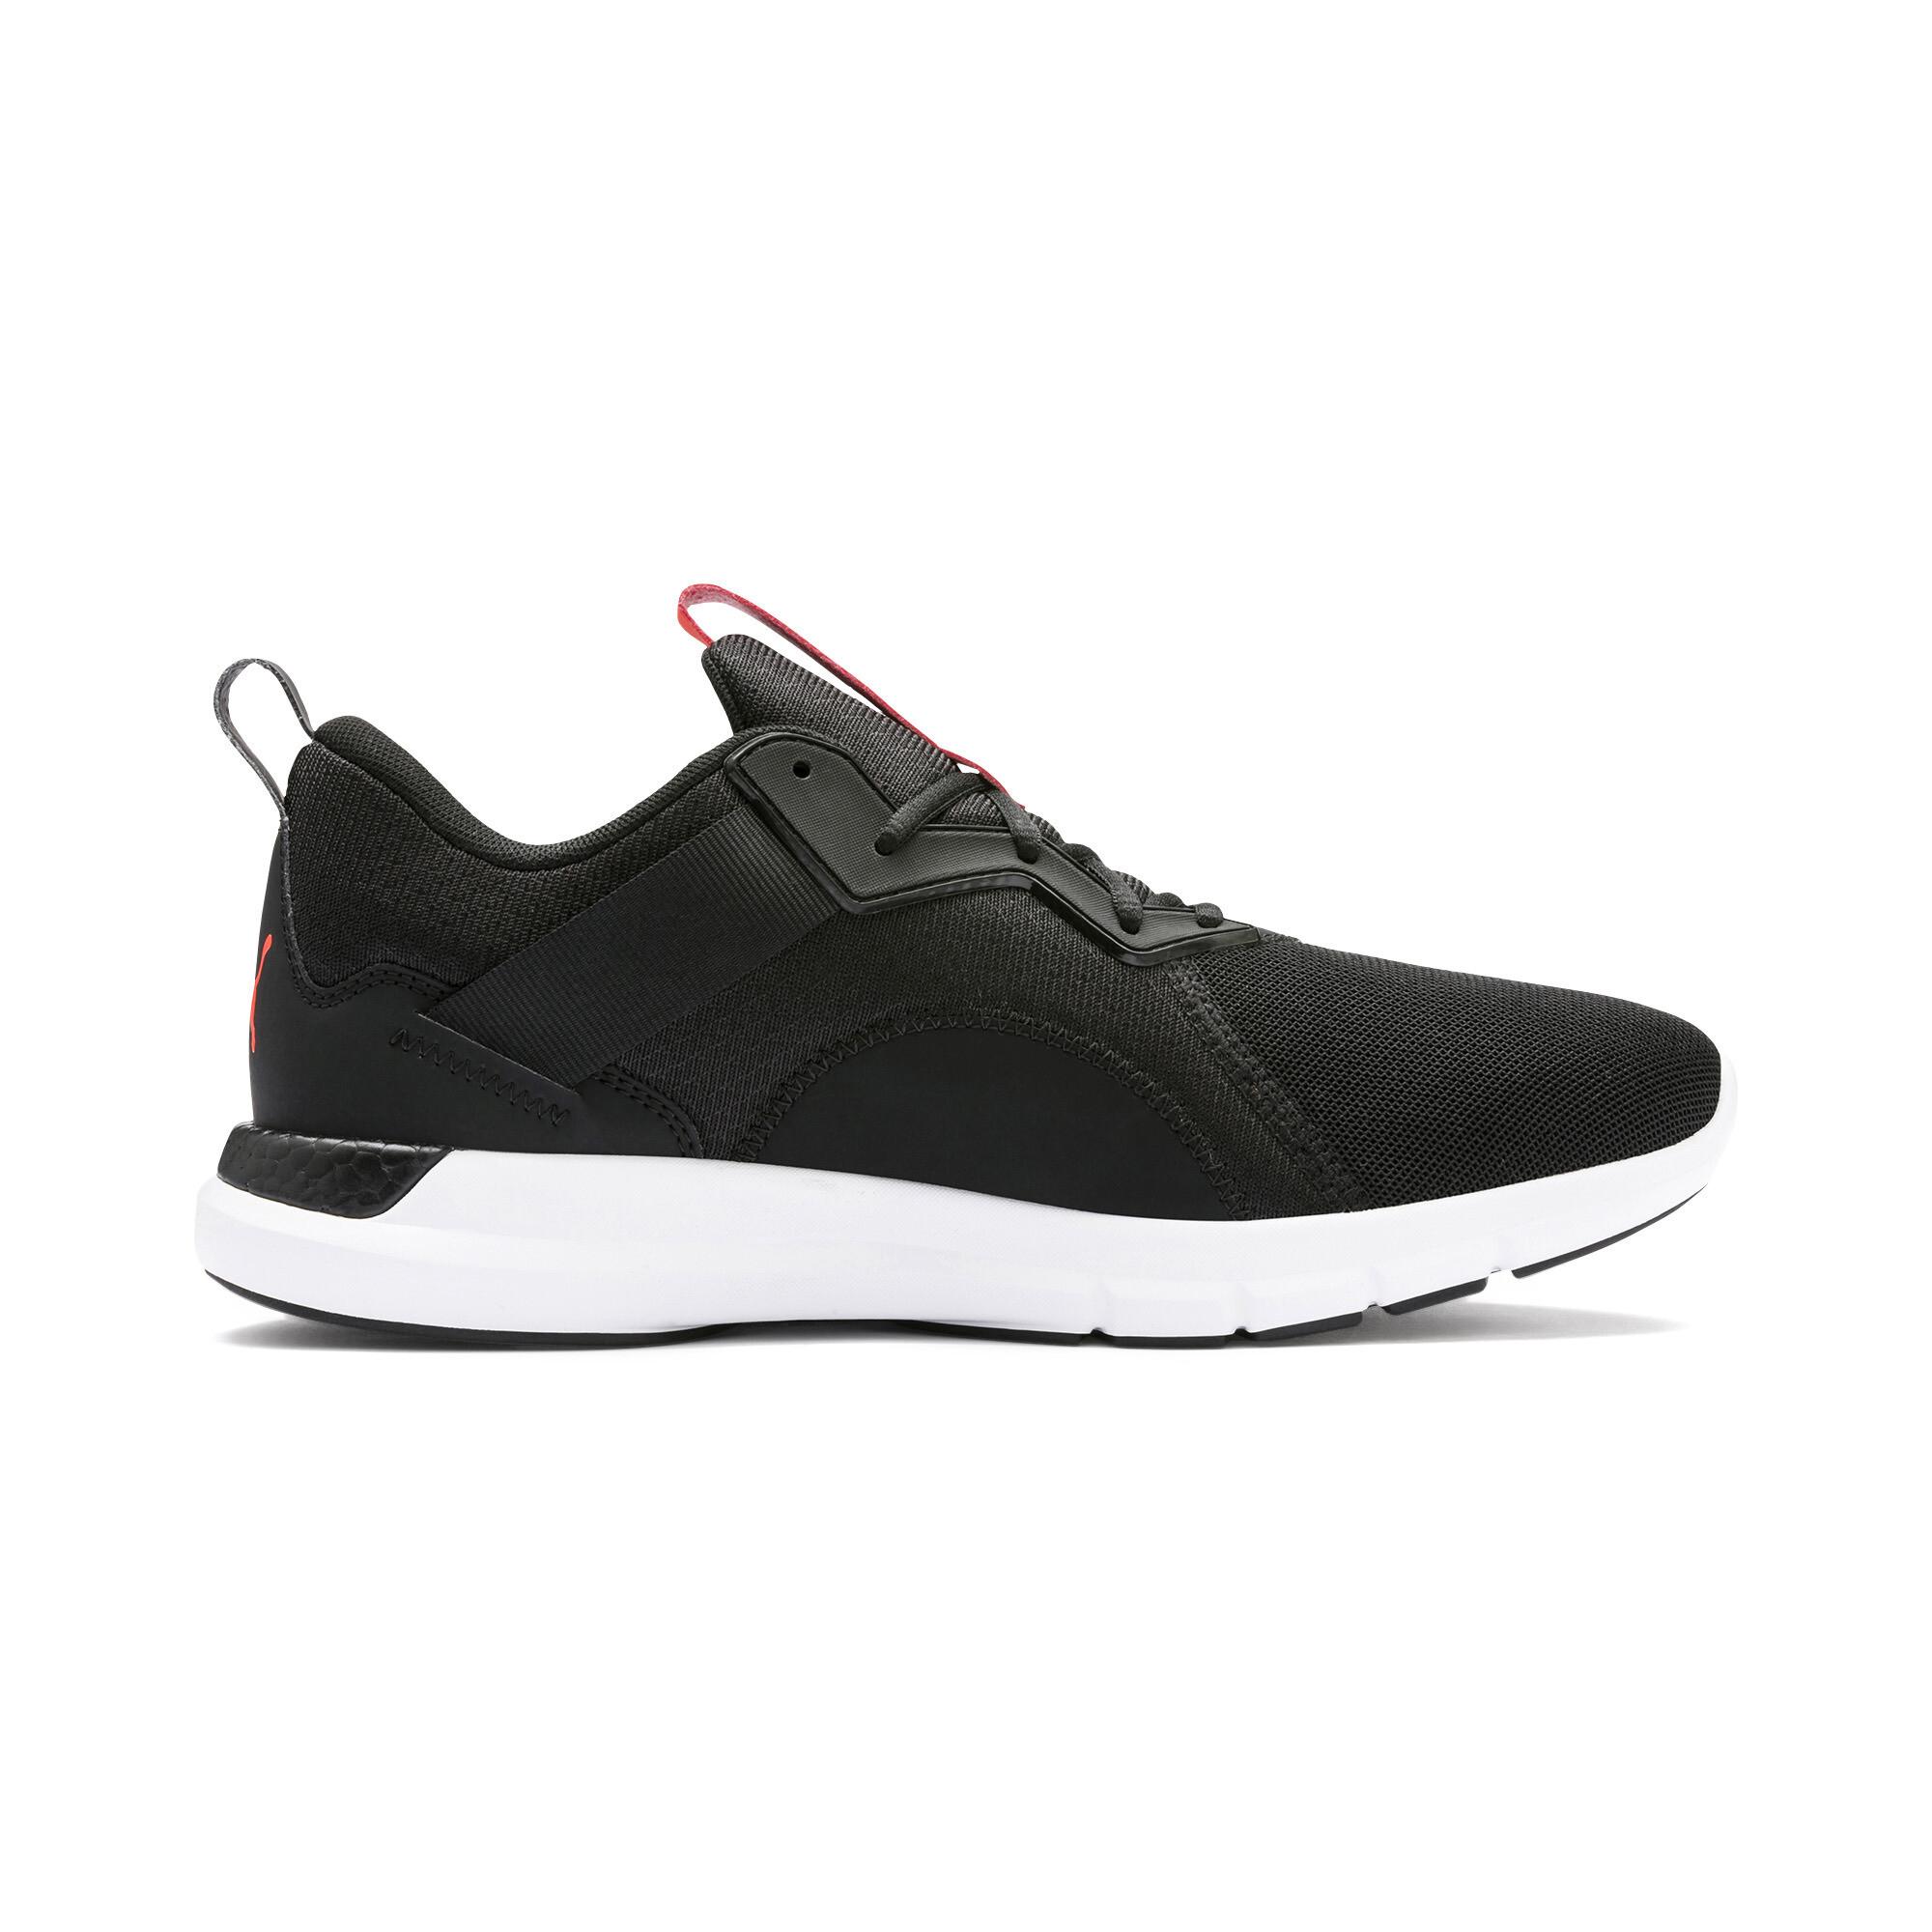 PUMA-NRGY-Dynamo-Futuro-Men-039-s-Running-Shoes-Men-Shoe-Running thumbnail 14